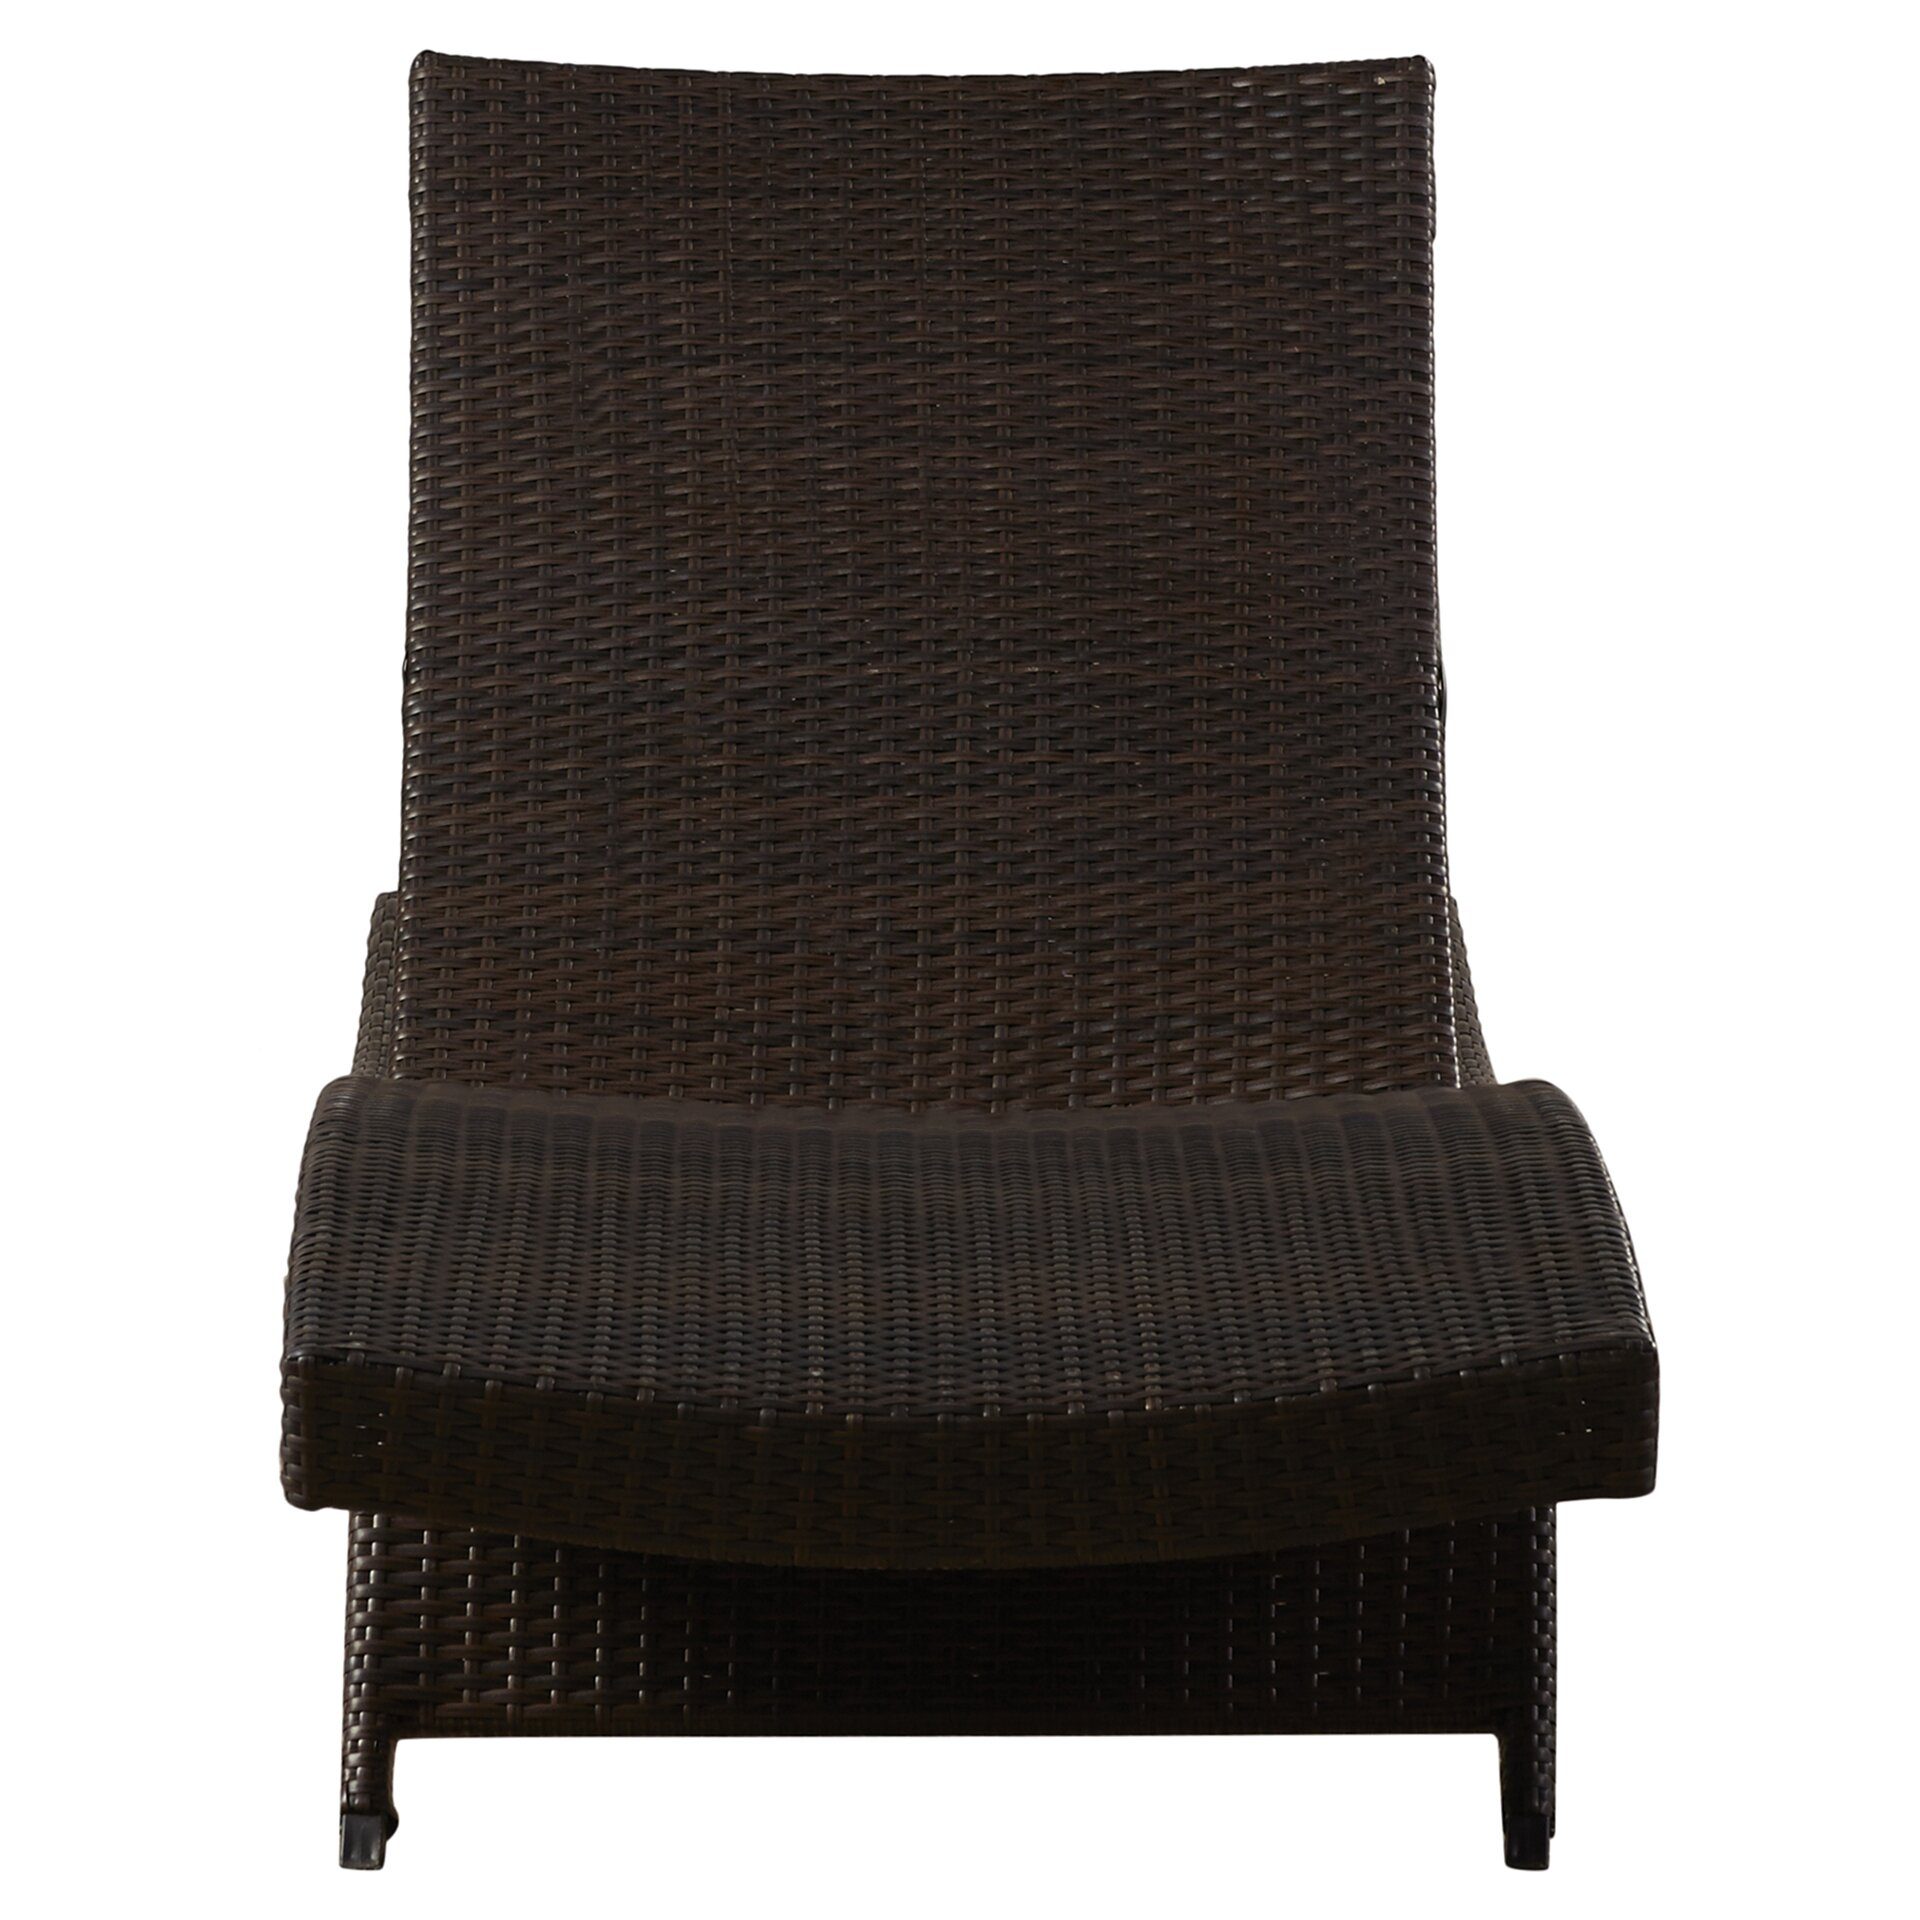 Brayden Studio Gadbois Adjustable Chaise Lounge Amp Reviews